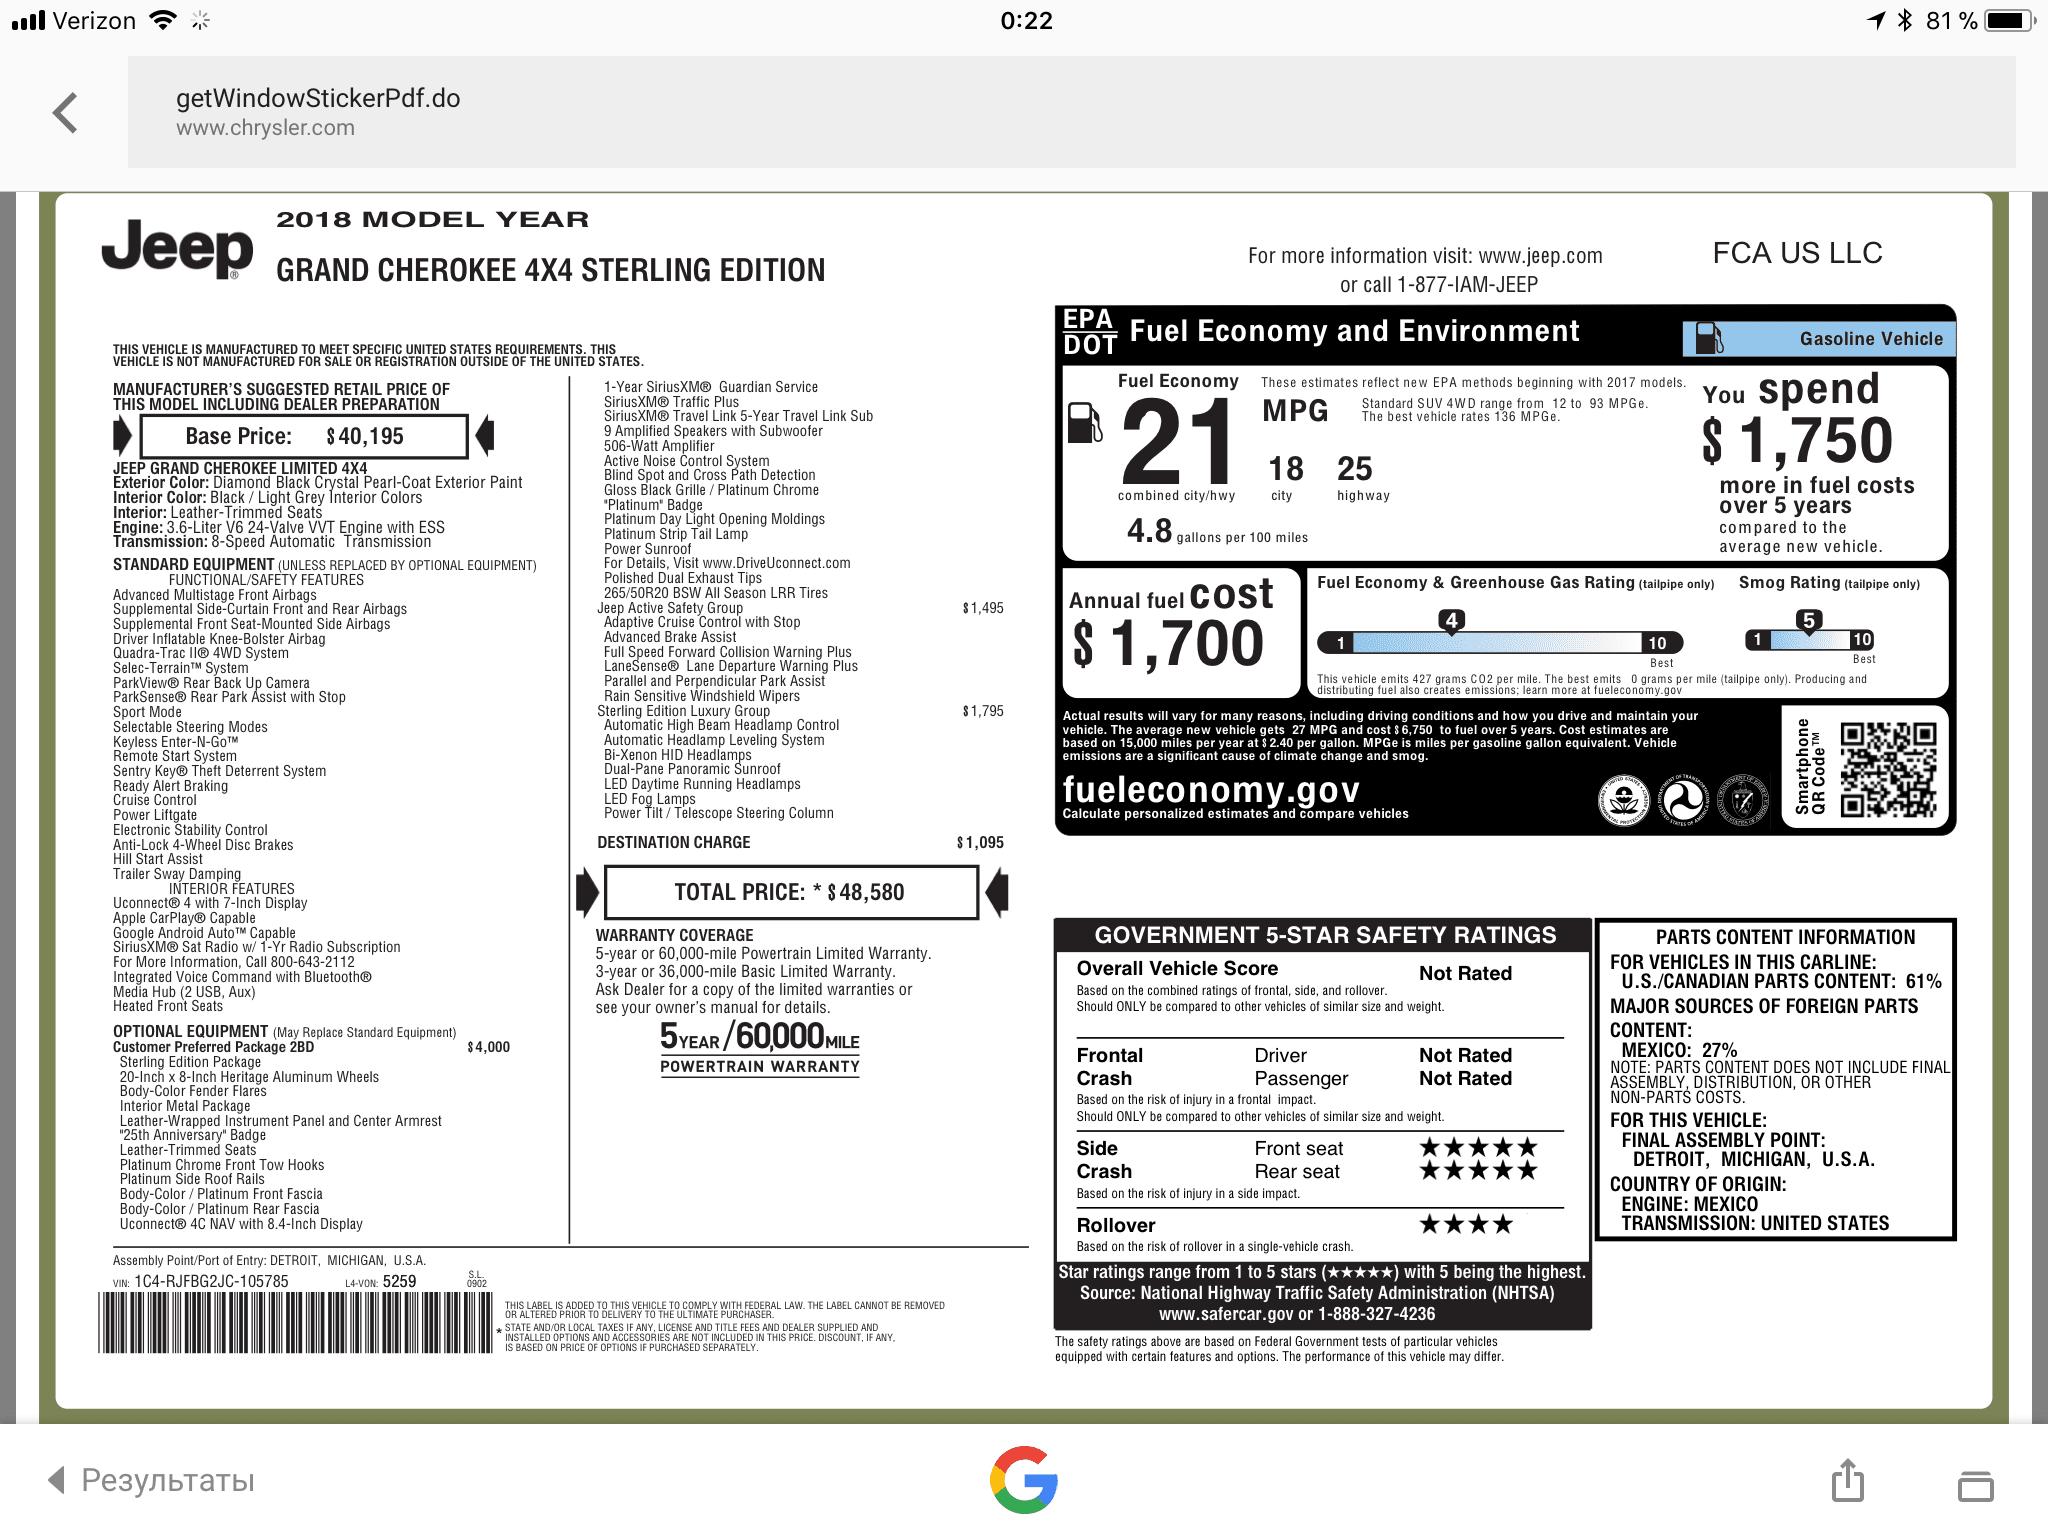 BB729924-79AF-4E8D-9F50-CFC58B11F7D7.png